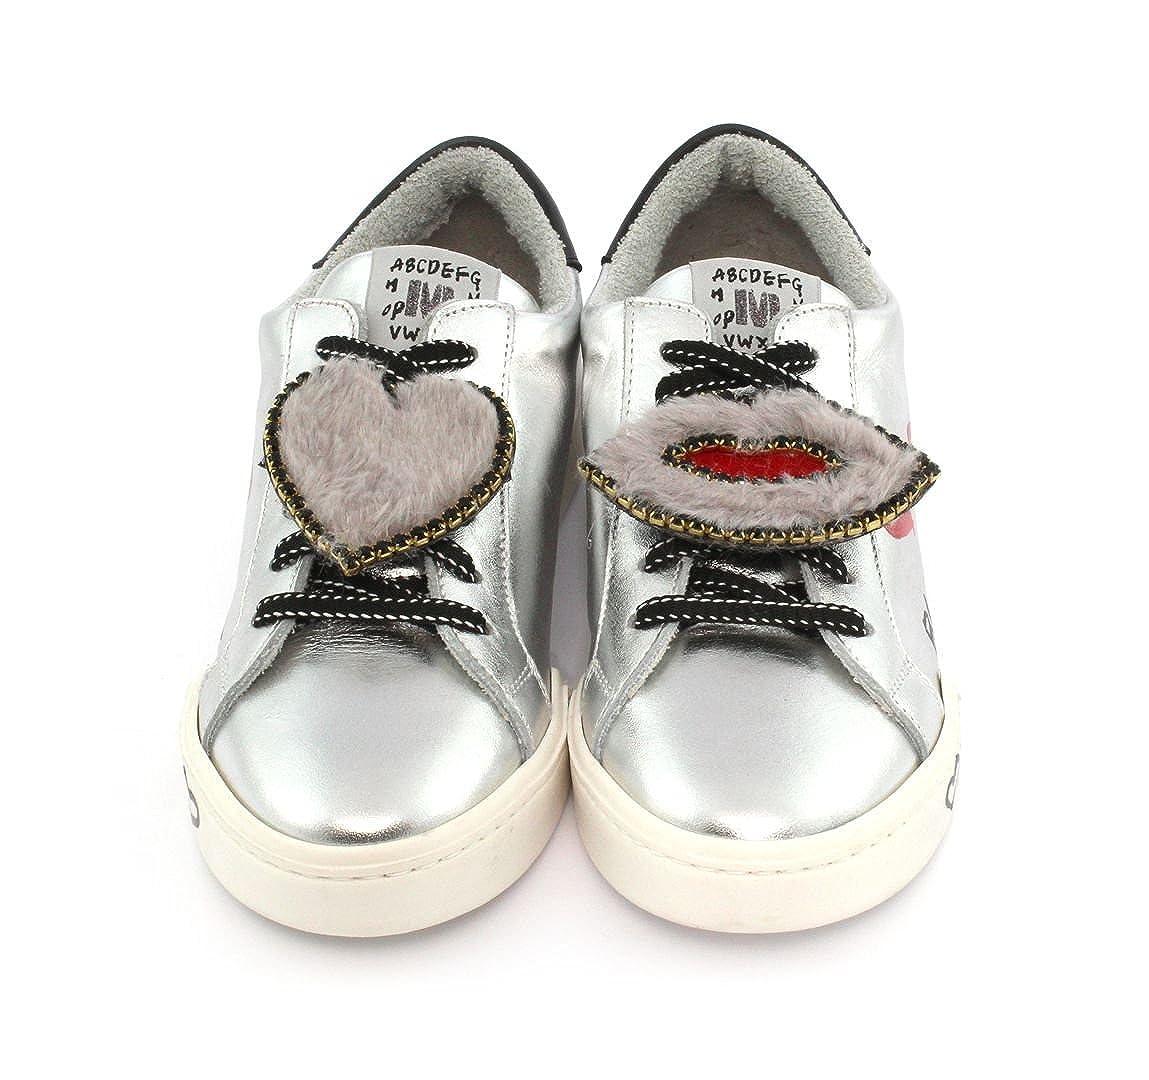 Sneaker MELINE D14 Velam Argento Bocca Cuore Grigio 37 EU